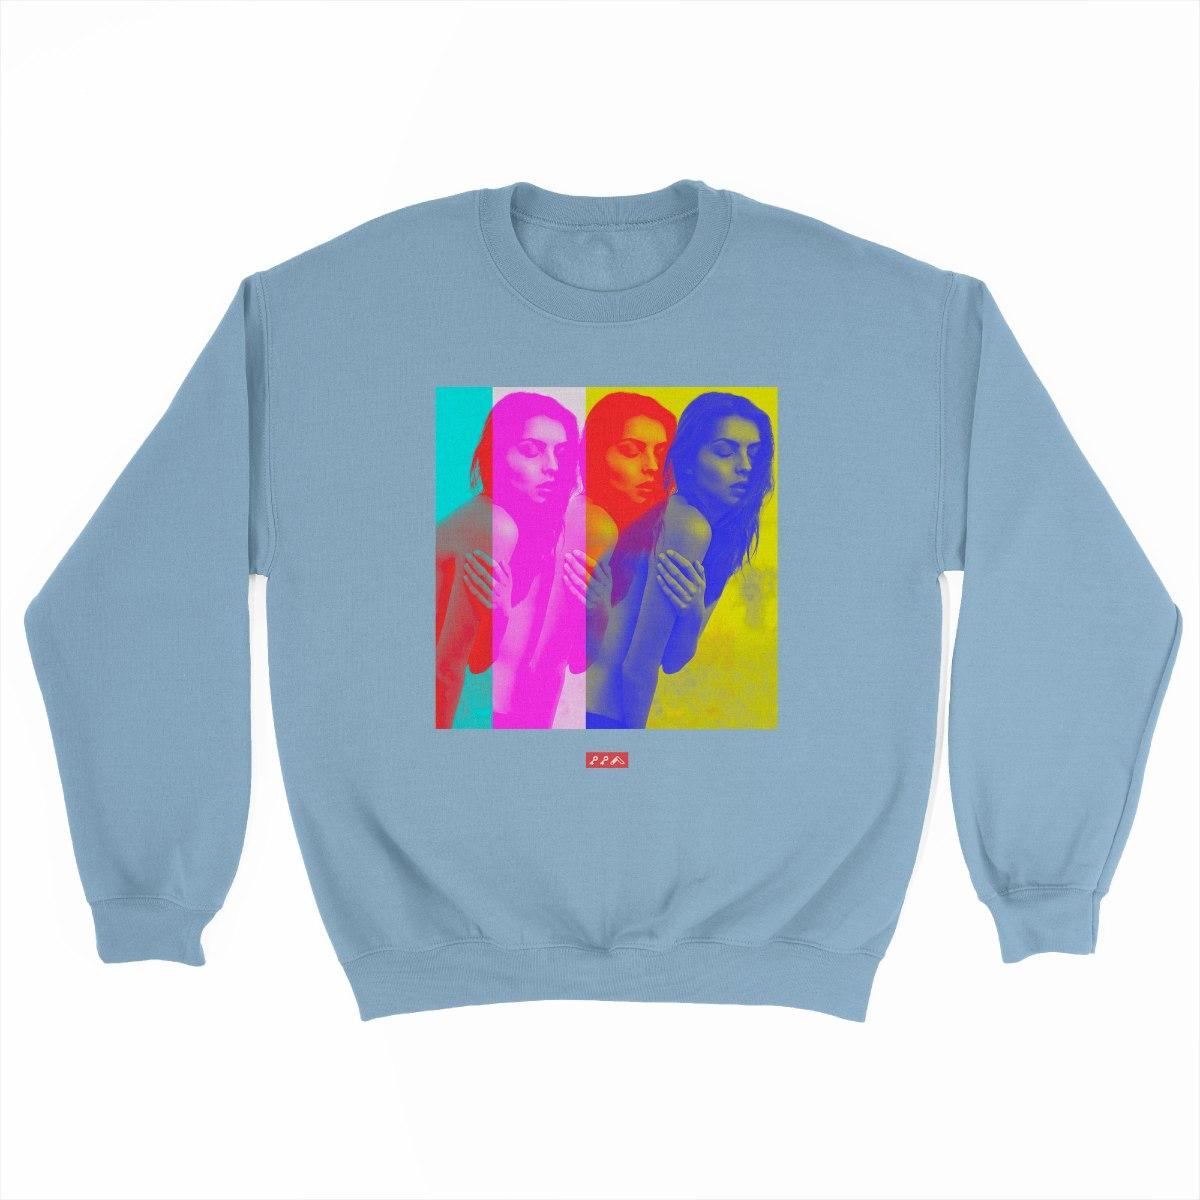 COLOURLESS COLOUR light blue crew sweatshirt at kikicutt.com